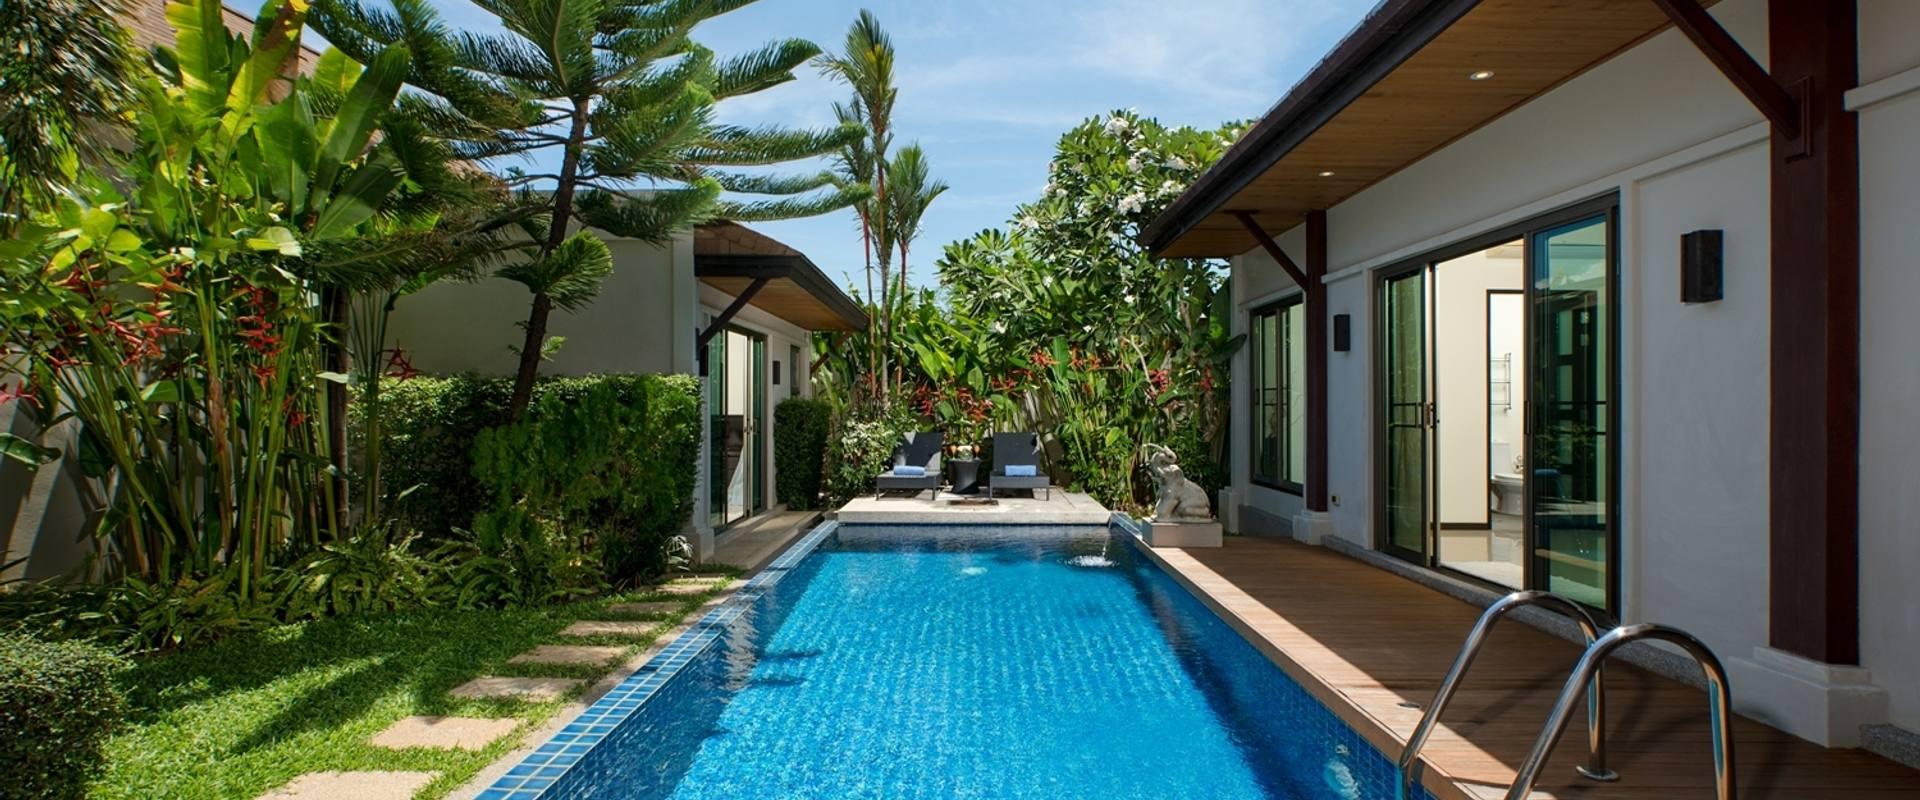 Vacation Rental Villa Ambon